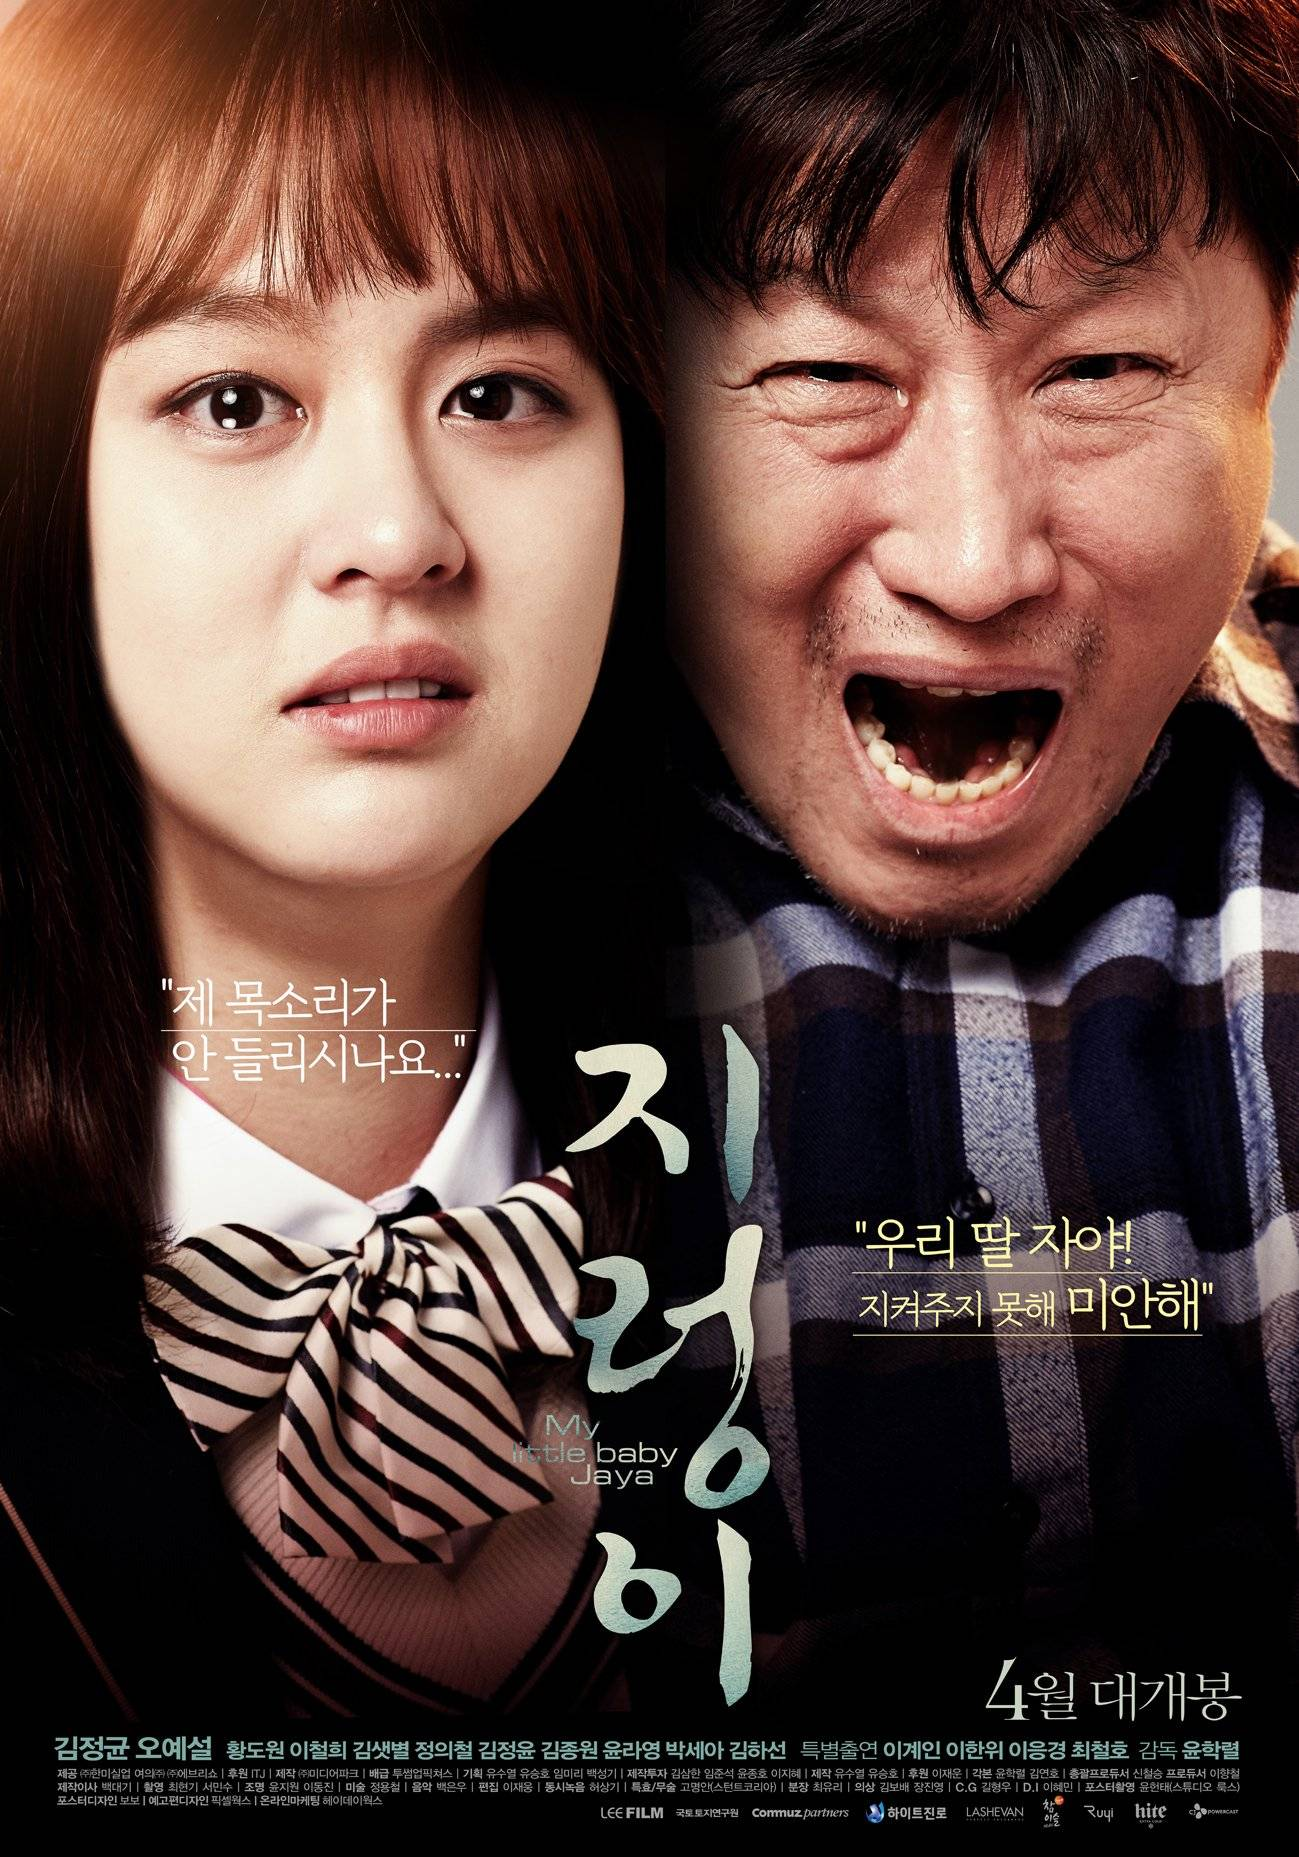 Review Film : My Little Baby, Jaya (2017) - Diary Jellybee